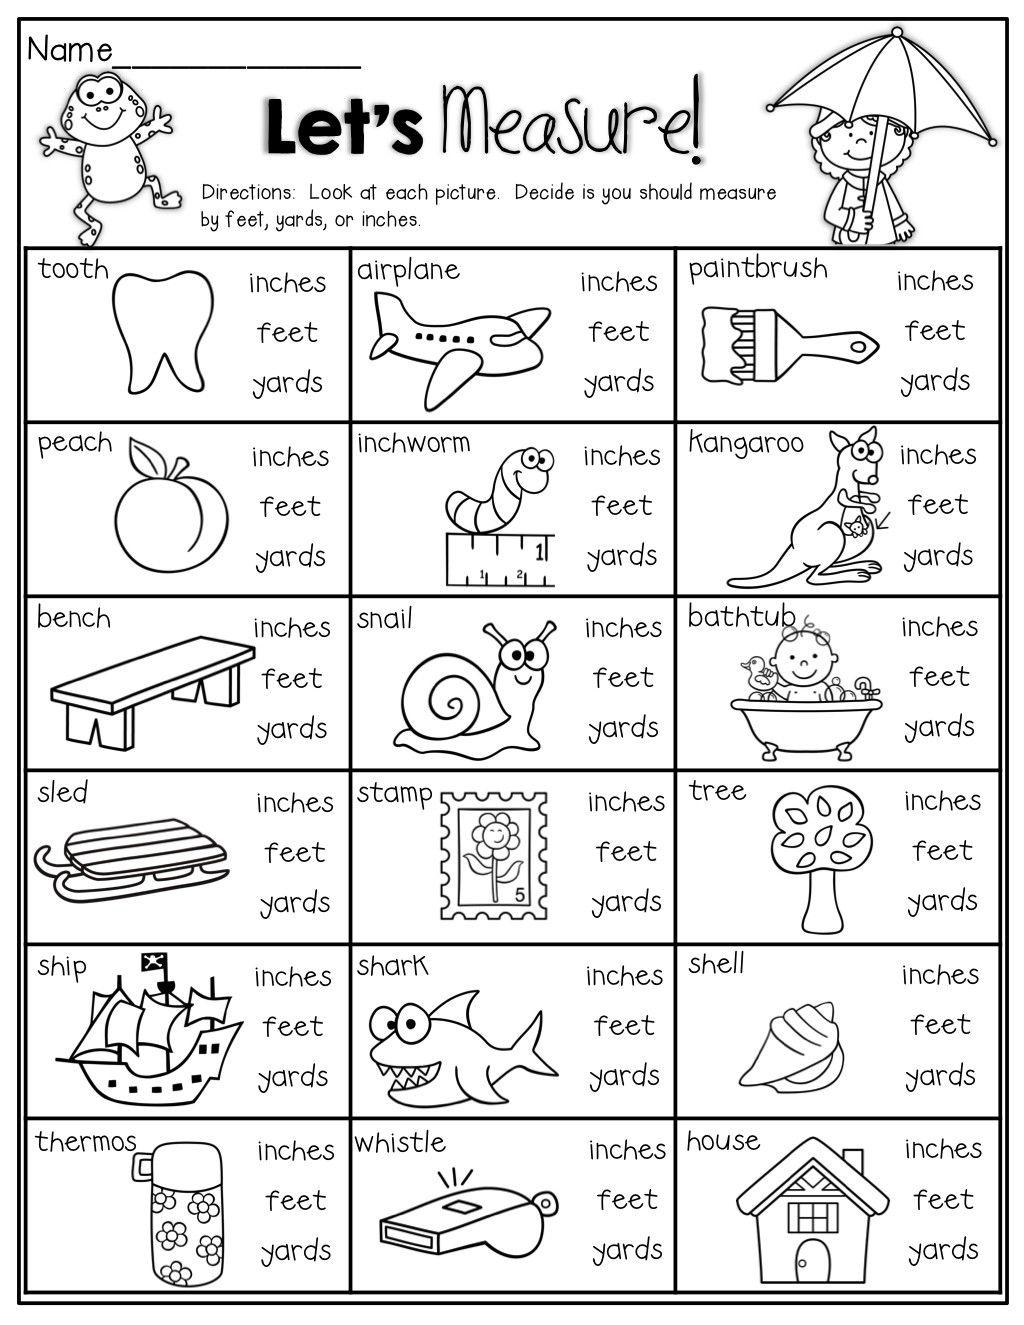 4 Worksheet Free Math Worksheets Second Grade 2 Measurement Convert Yards  Feet Inches Easy Le.…   Measurement worksheets [ 1325 x 1024 Pixel ]